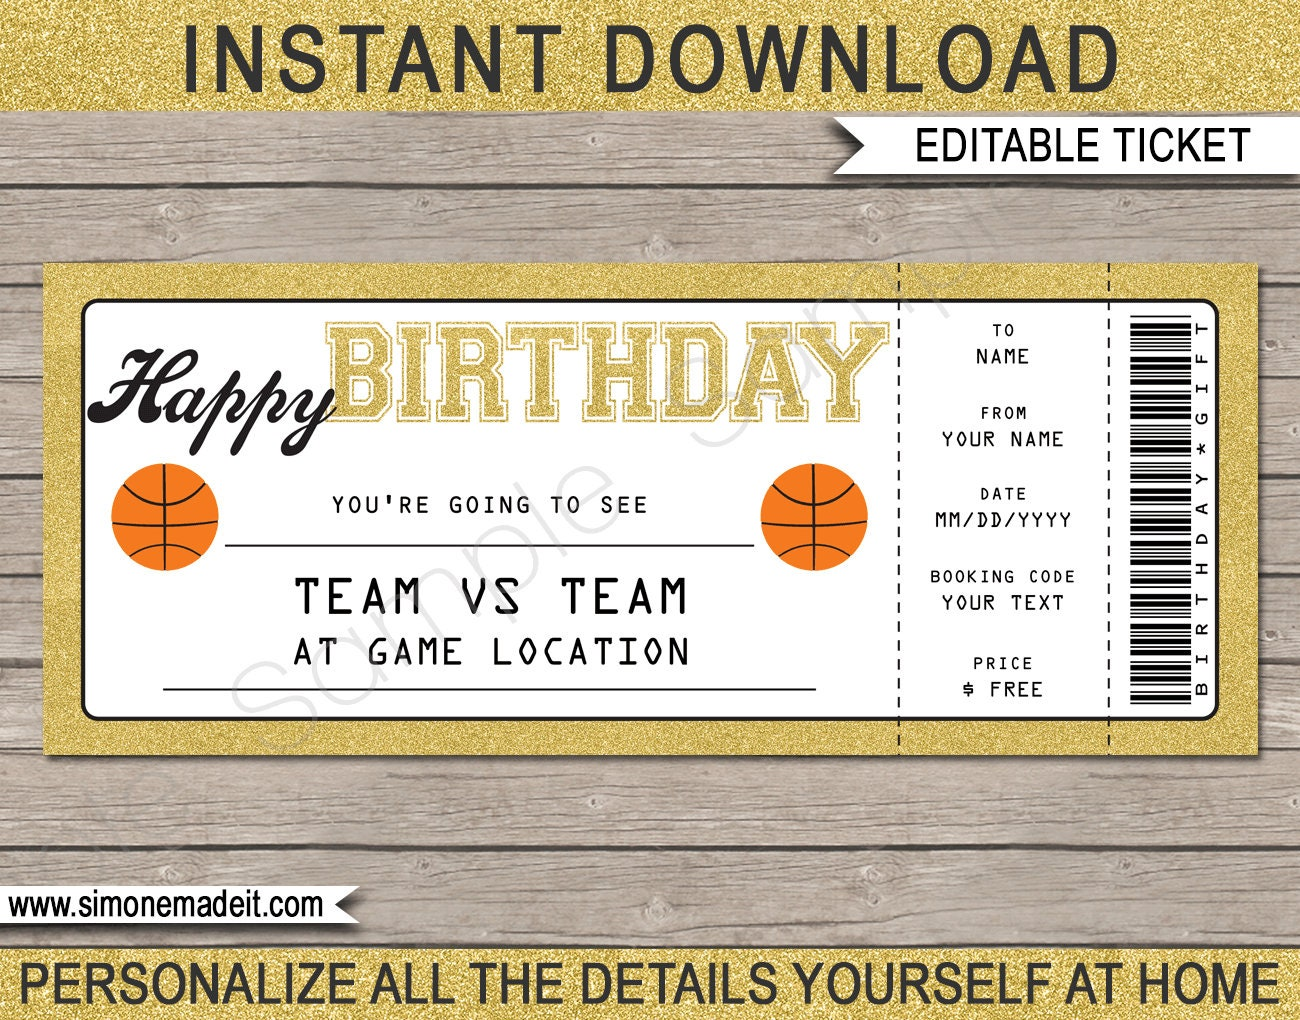 Birthday Basketball Game Ticket Gift - Surprise Ticket to Basketball Game -  Printable template - Gift Voucher - INSTANT DOWNLOAD - EDITABLE